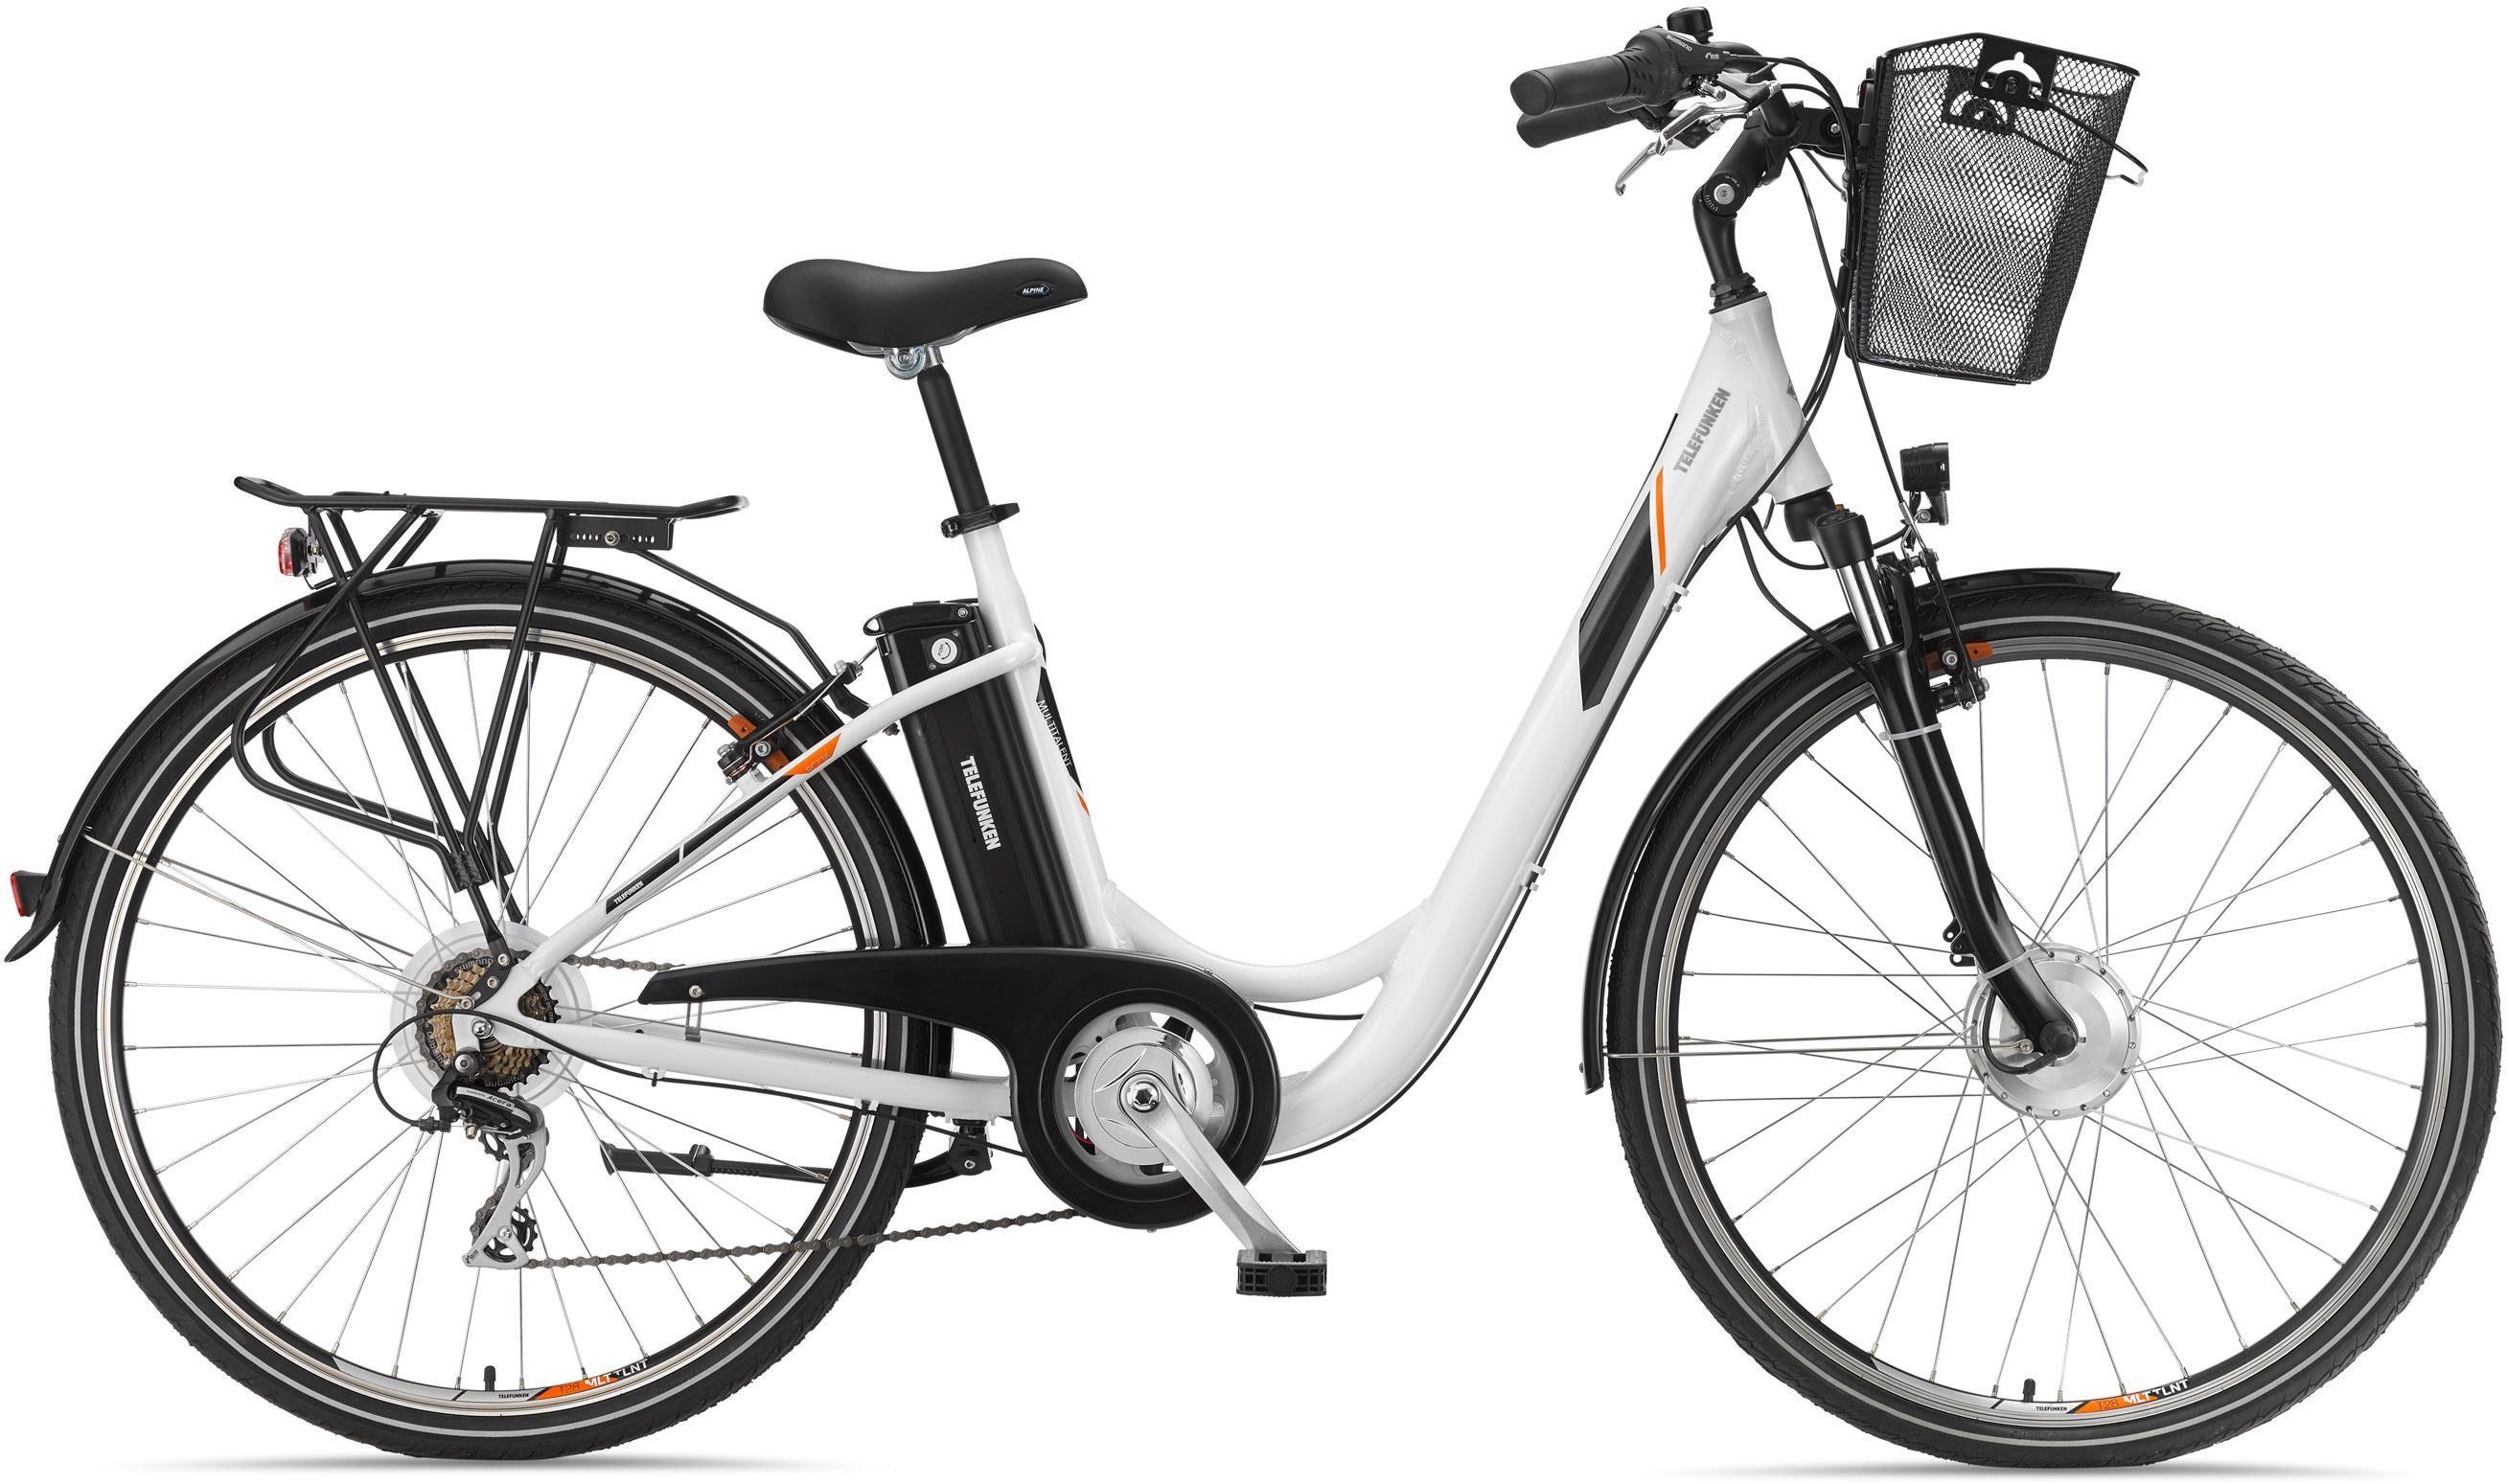 Telefunken Alu City E-Bike, 28 Zoll, 7-Gang Shimano Tourney Kettenschaltung, »RC736 Multitalent«